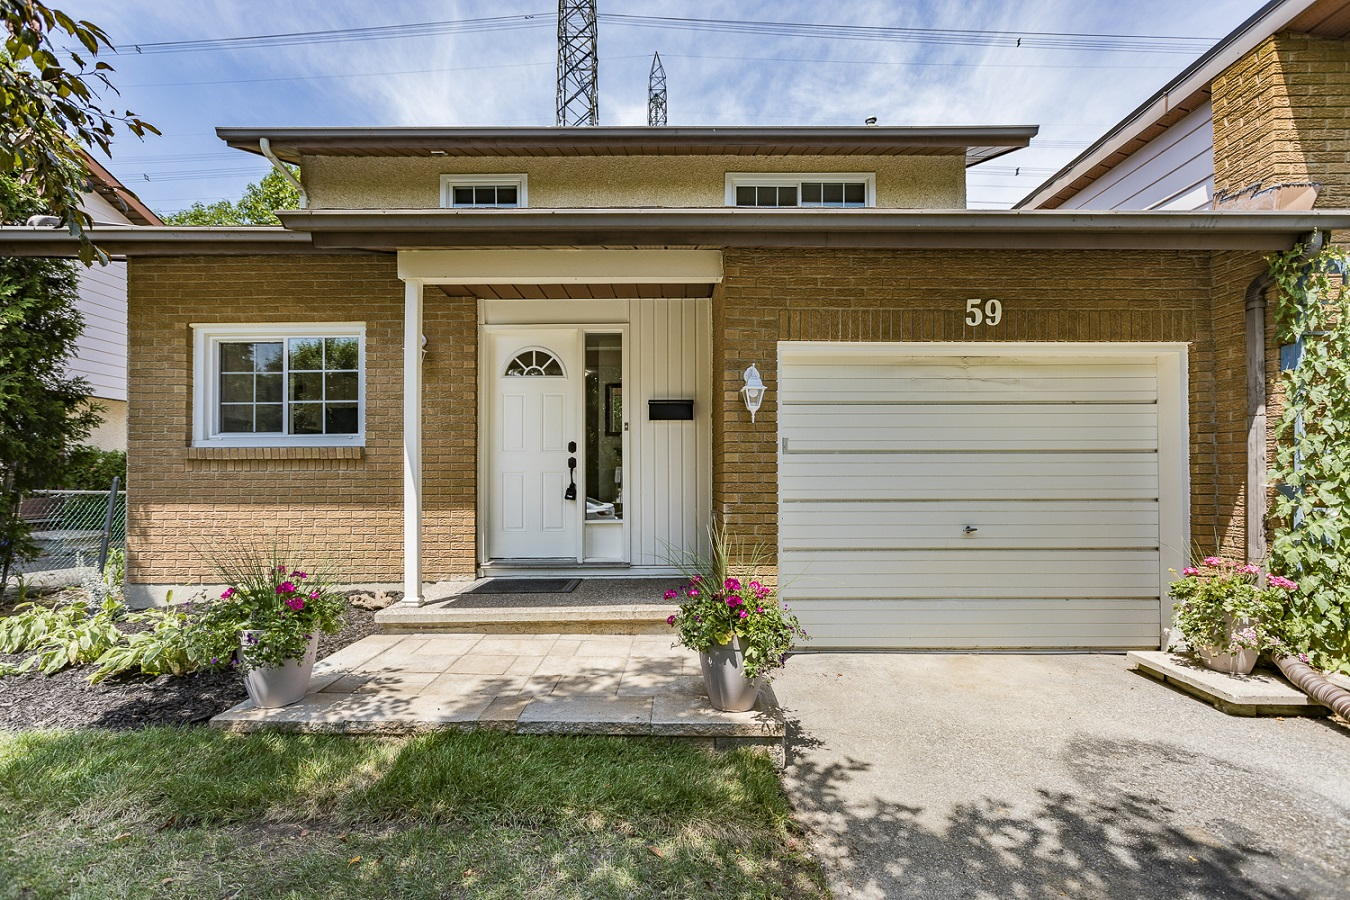 59 Benlea Drive | Semi-Detached Home in Tanglewood